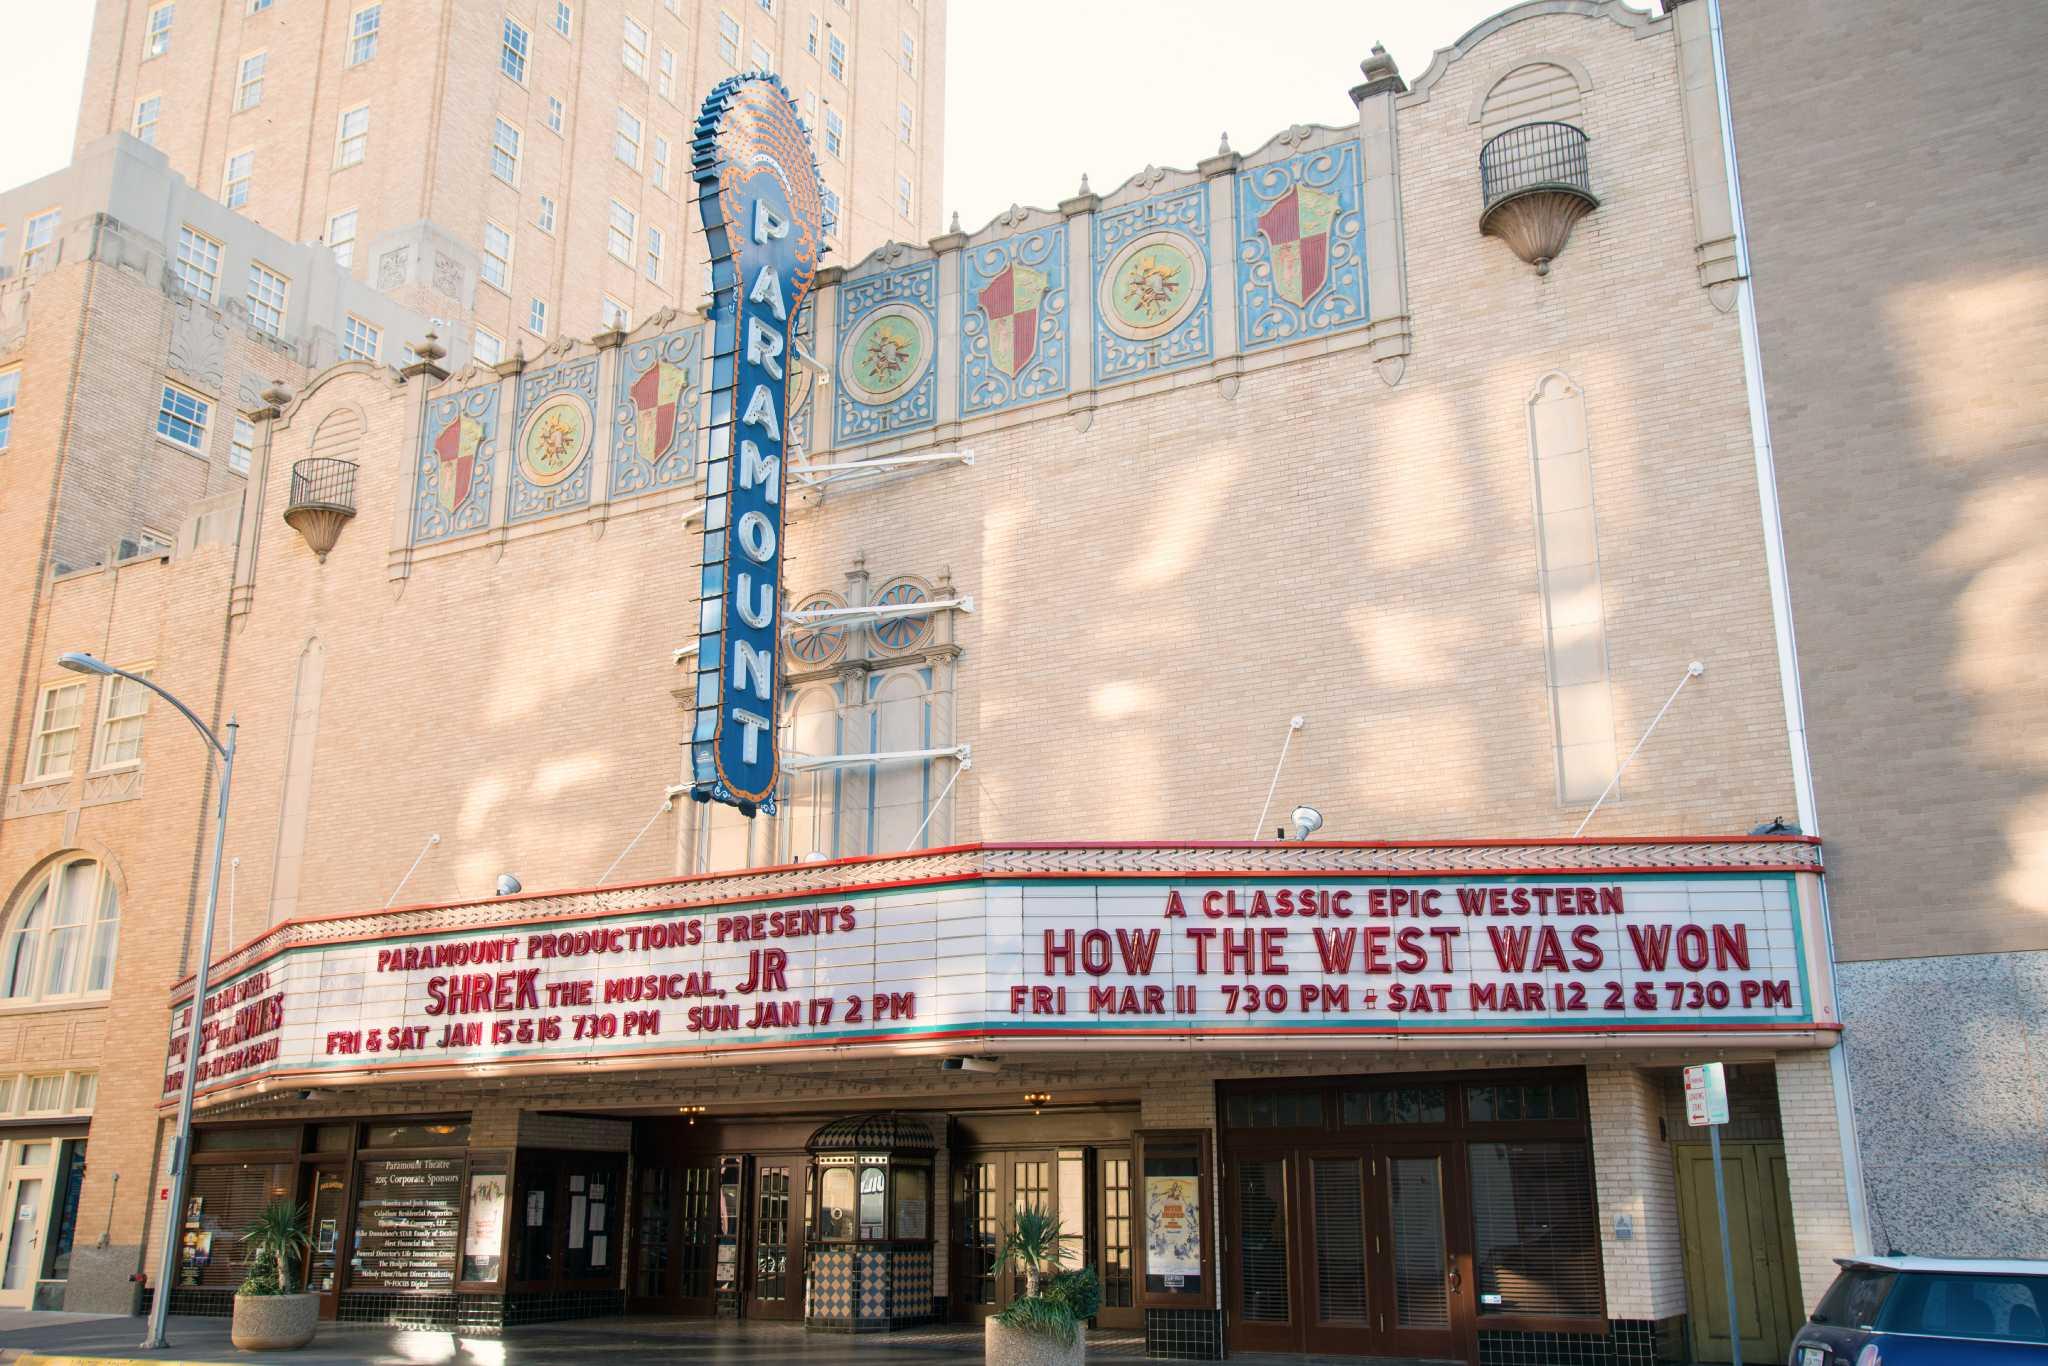 10 Things To Do In Abilene For 2016 Houston Chronicle